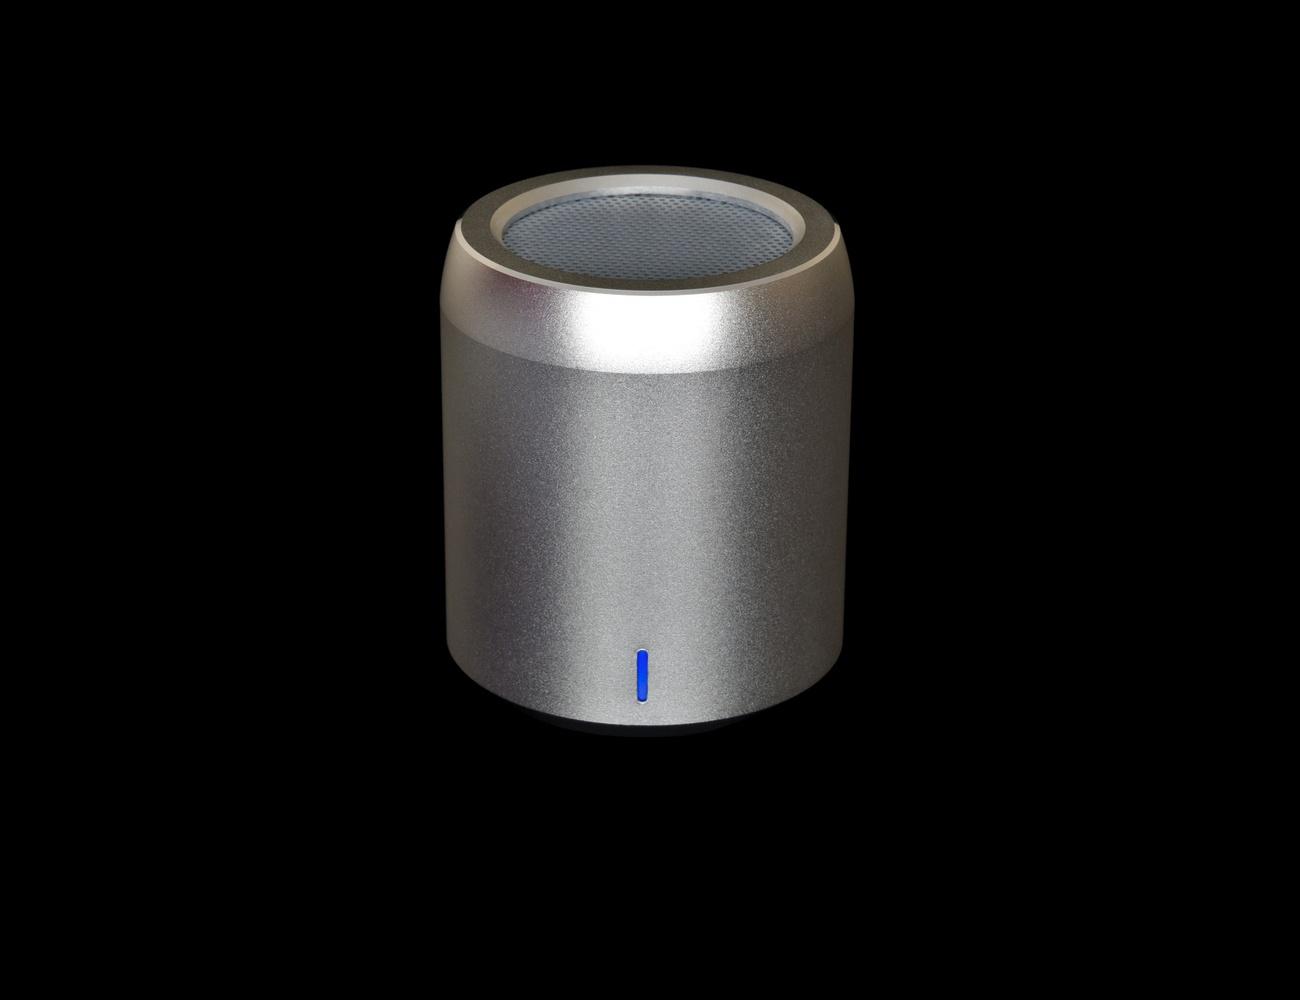 Miniaudio Mi v2.0 by Niko Audio